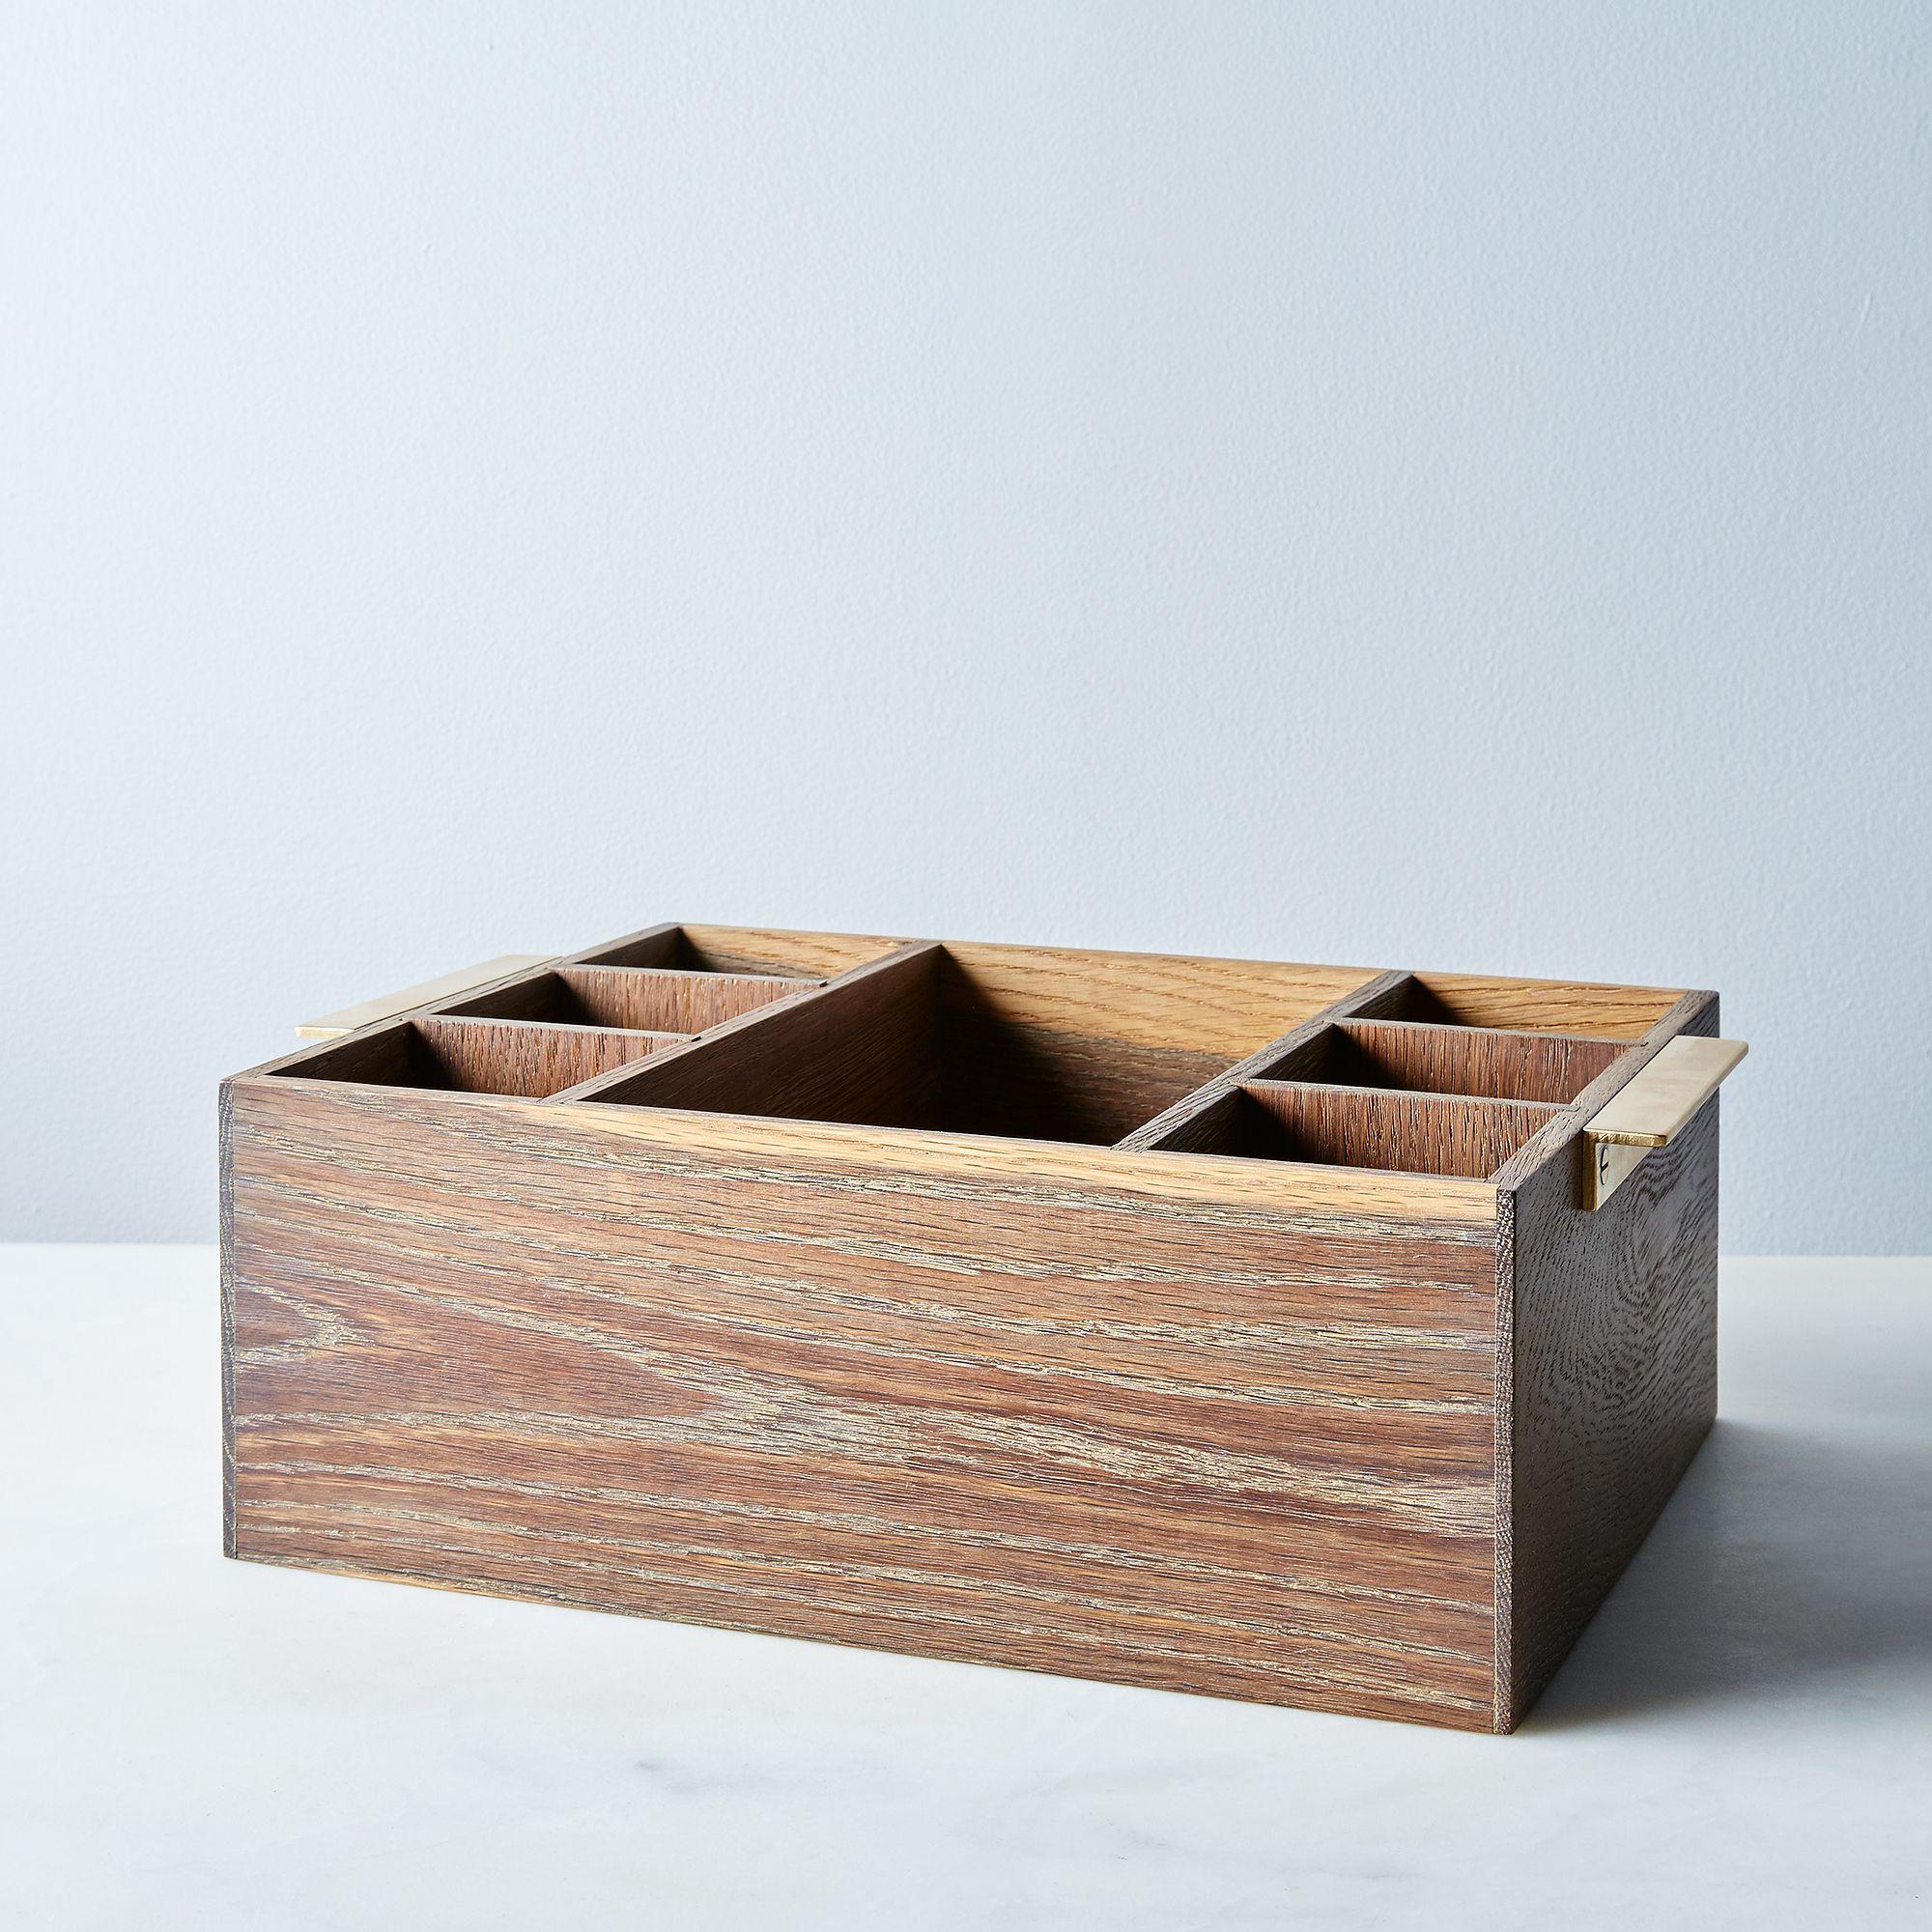 Wooden & Brass Flatware Holder Large Fumed Oak, Brass Handles